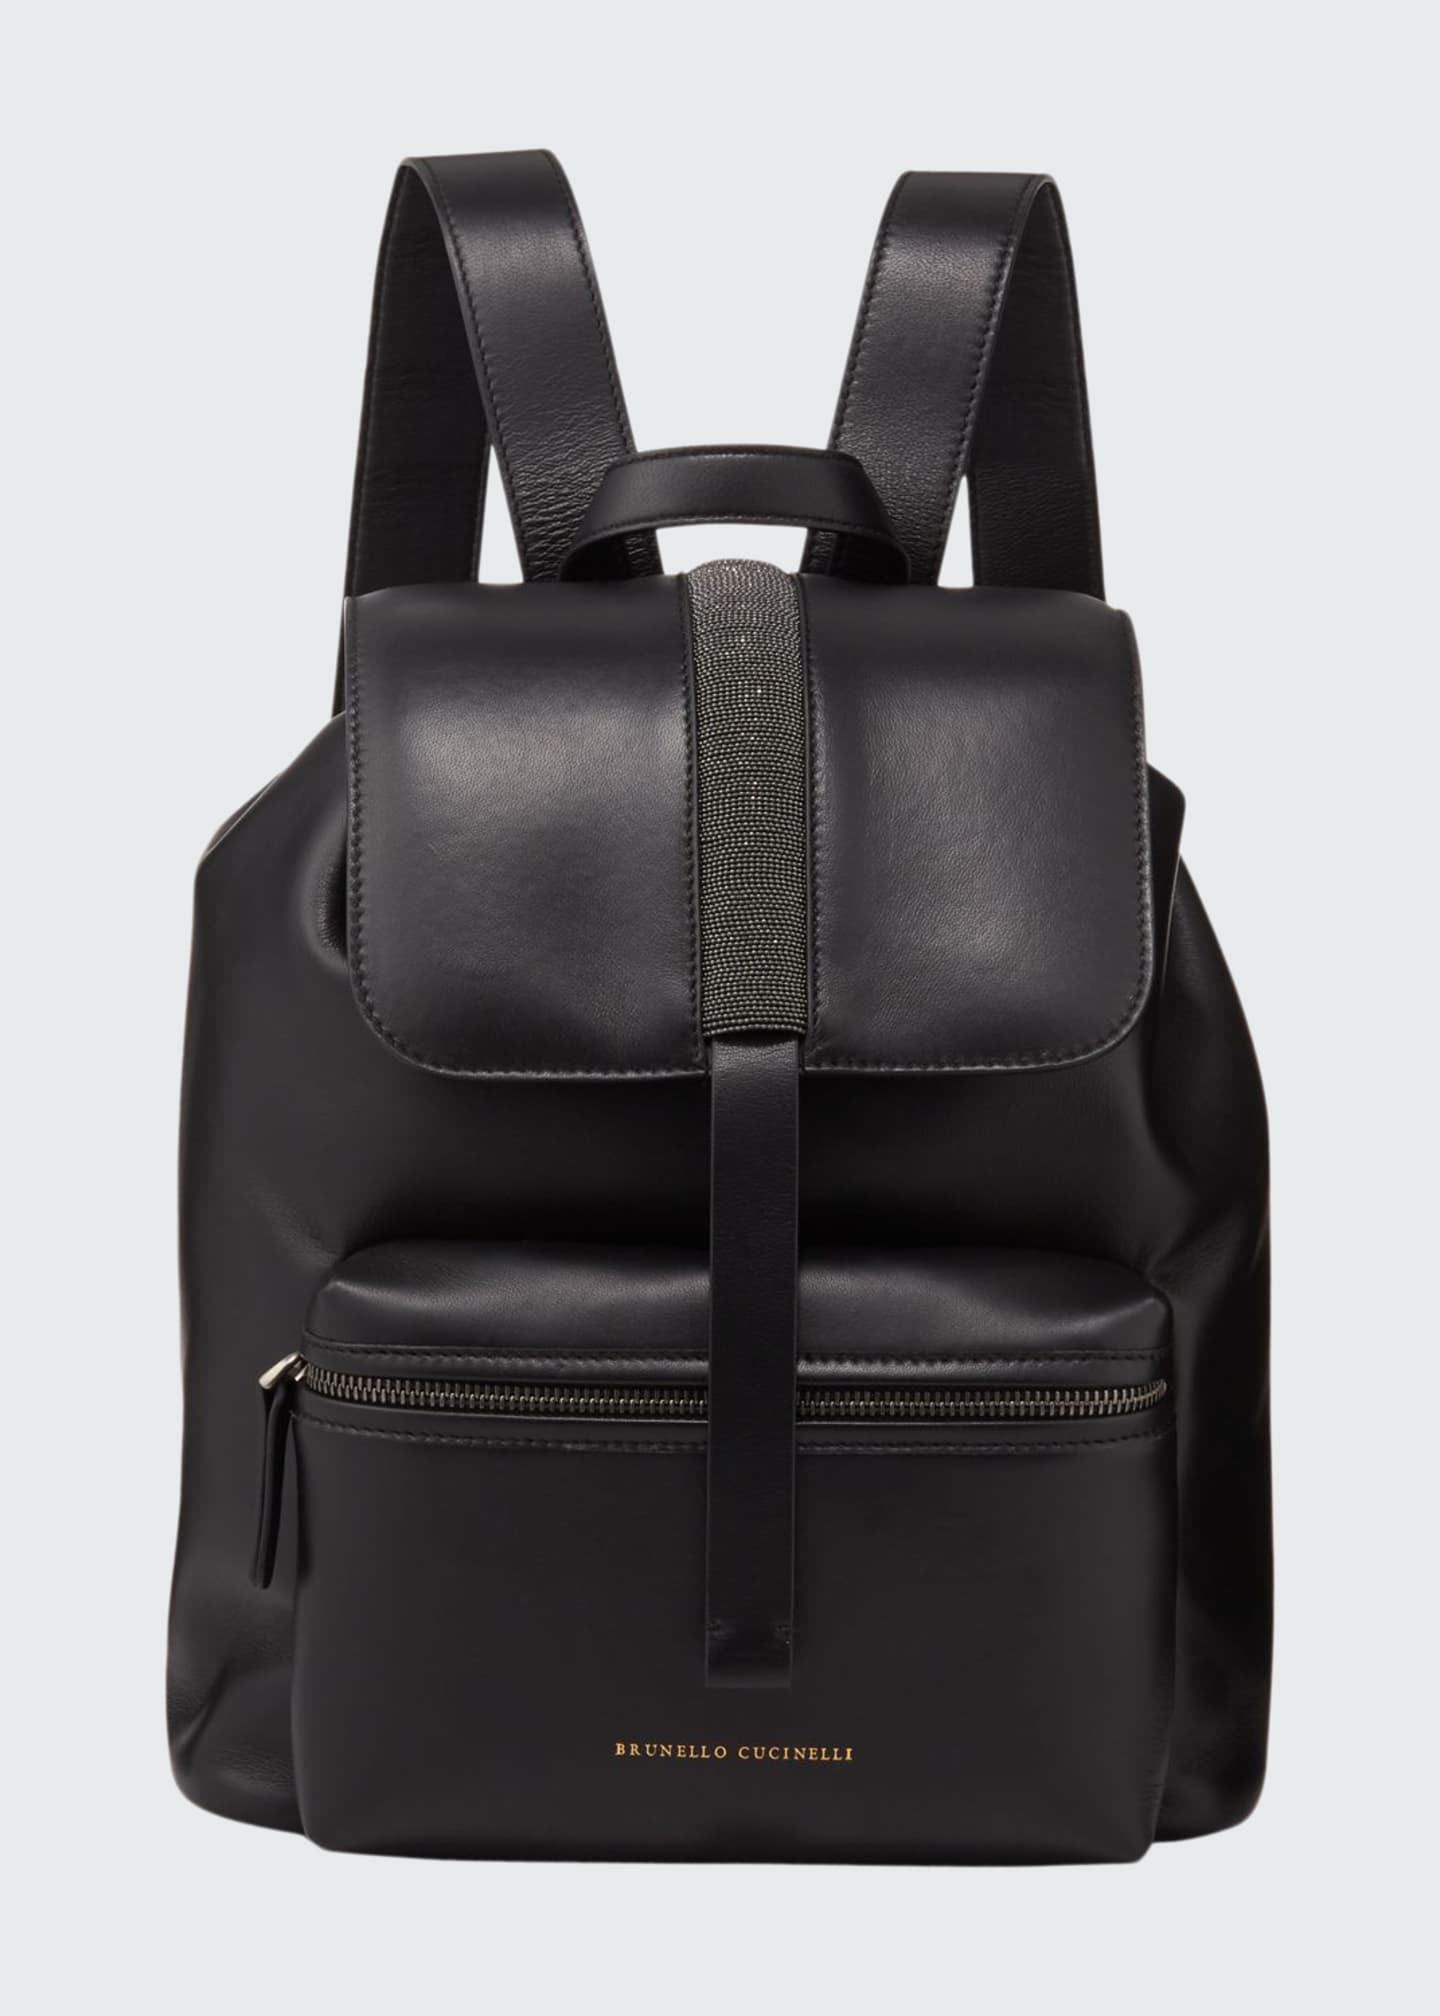 Brunello Cucinelli Napa Super Soft Backpack